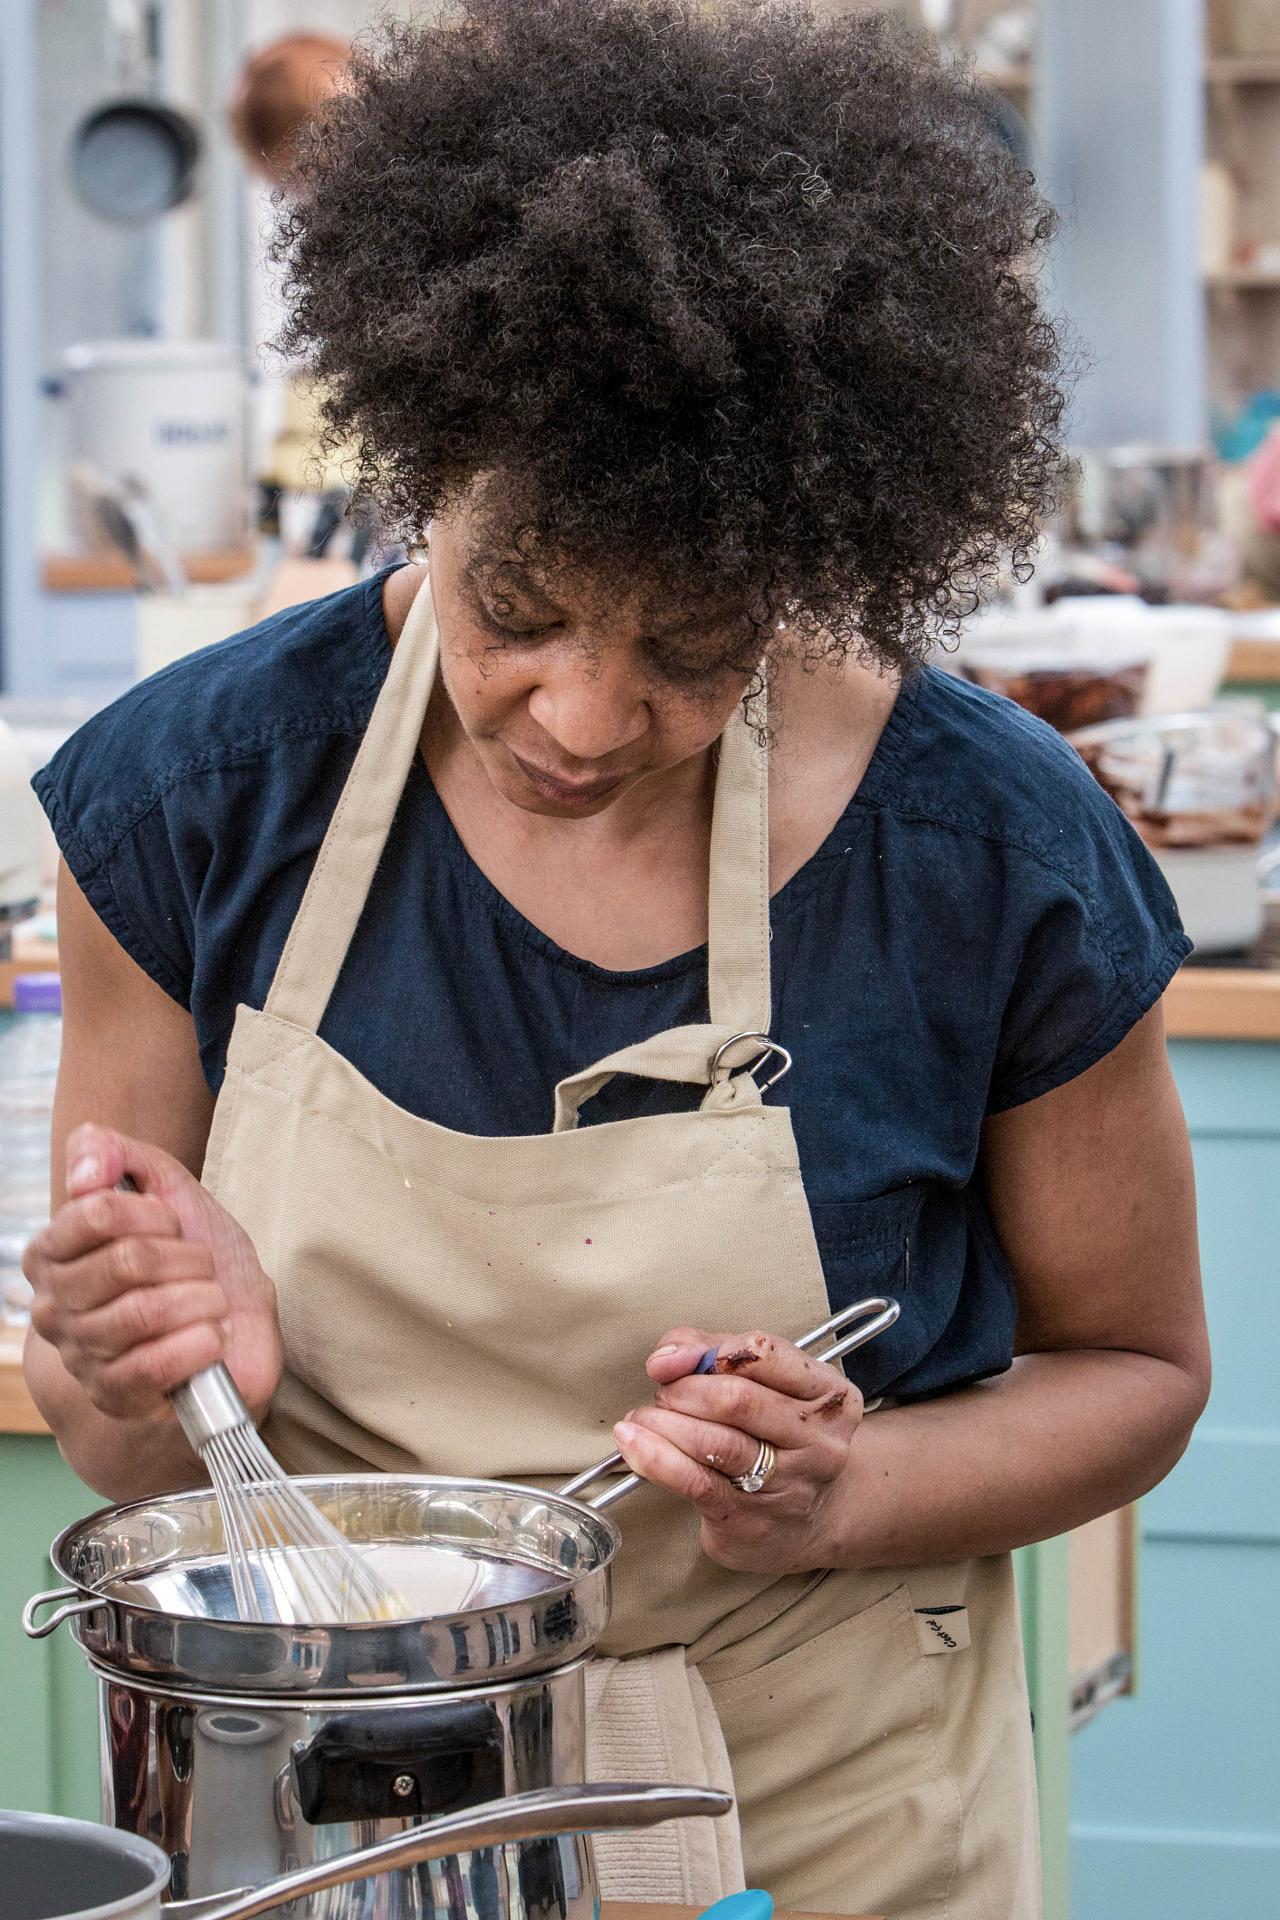 Oven Used In Bake Off Gallery Uktv Great British Bake Off